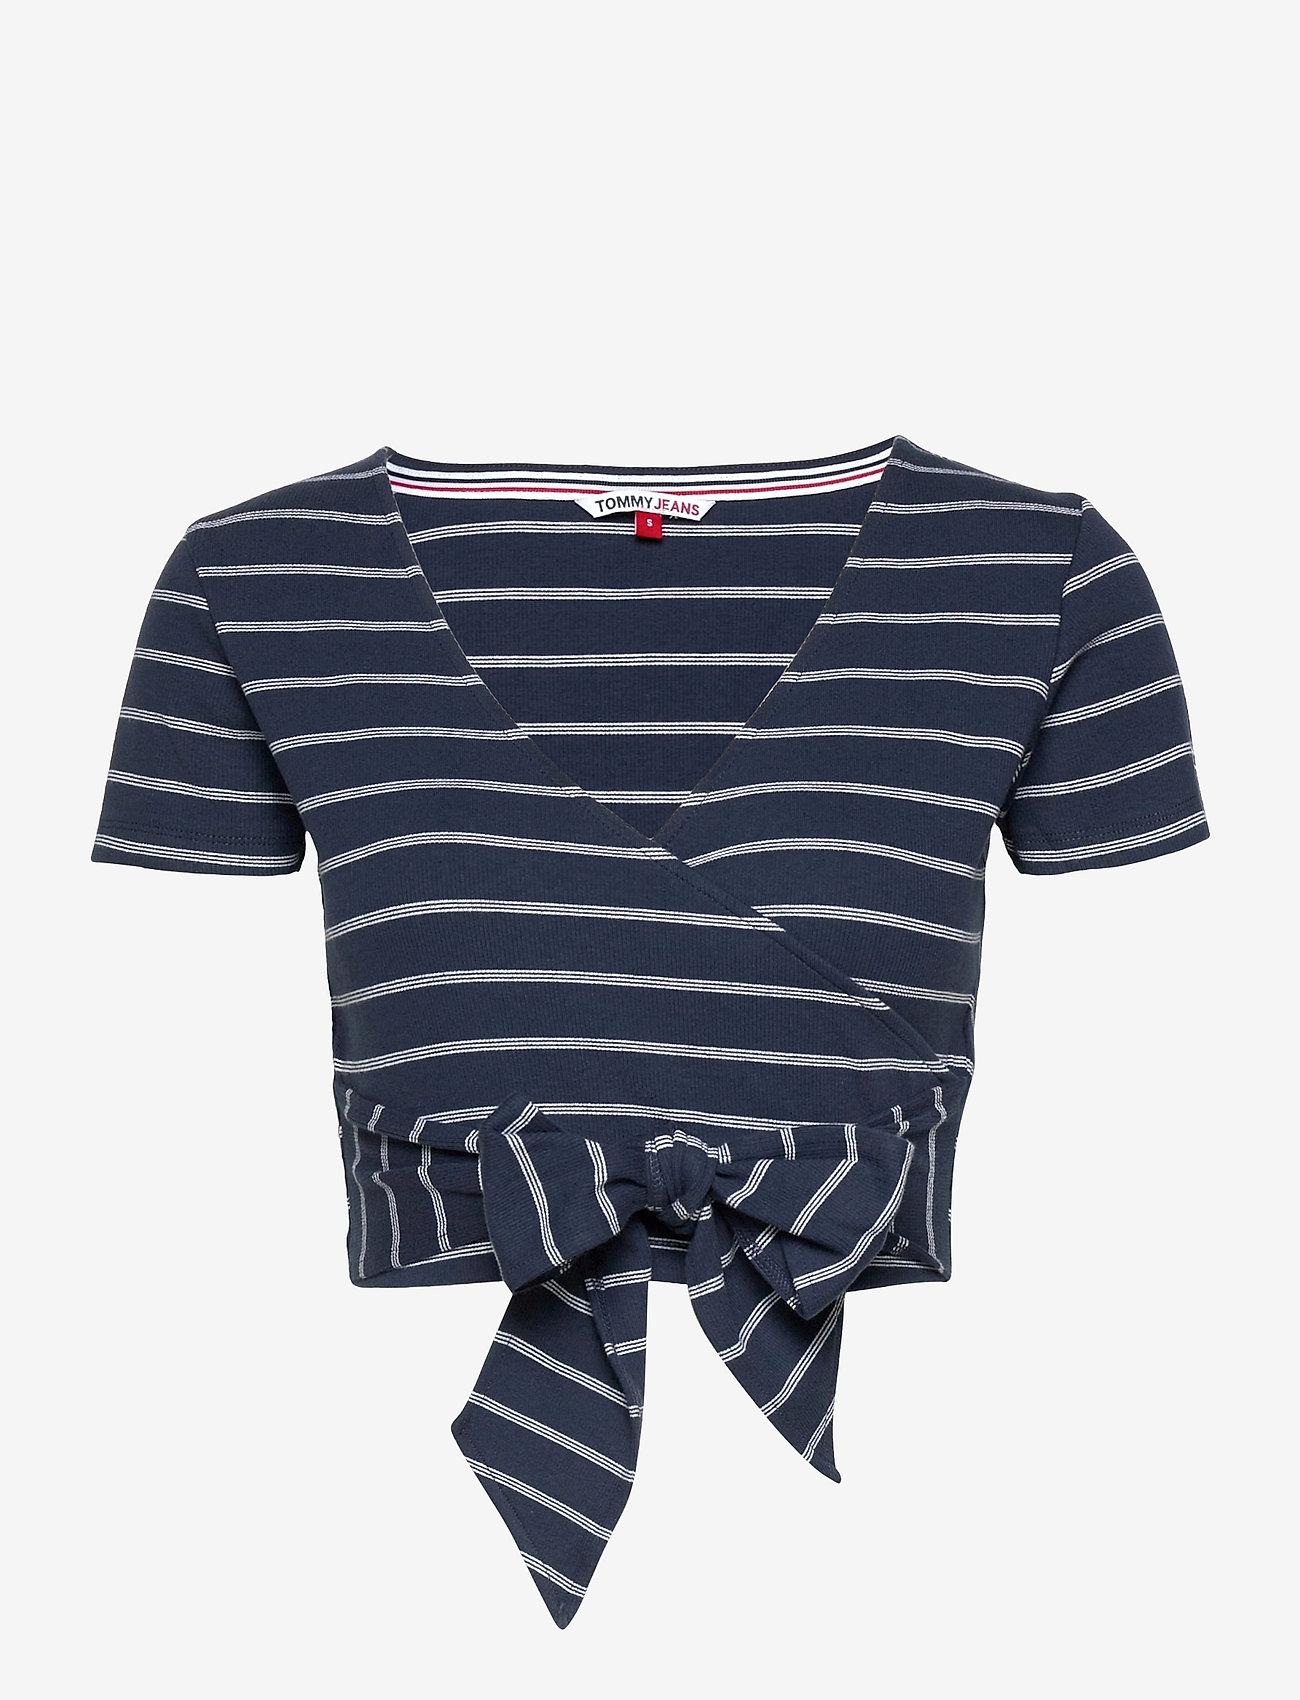 Tommy Jeans - TJW STRIPED WRAP TOP - crop tops - twilight navy / white stripe - 0